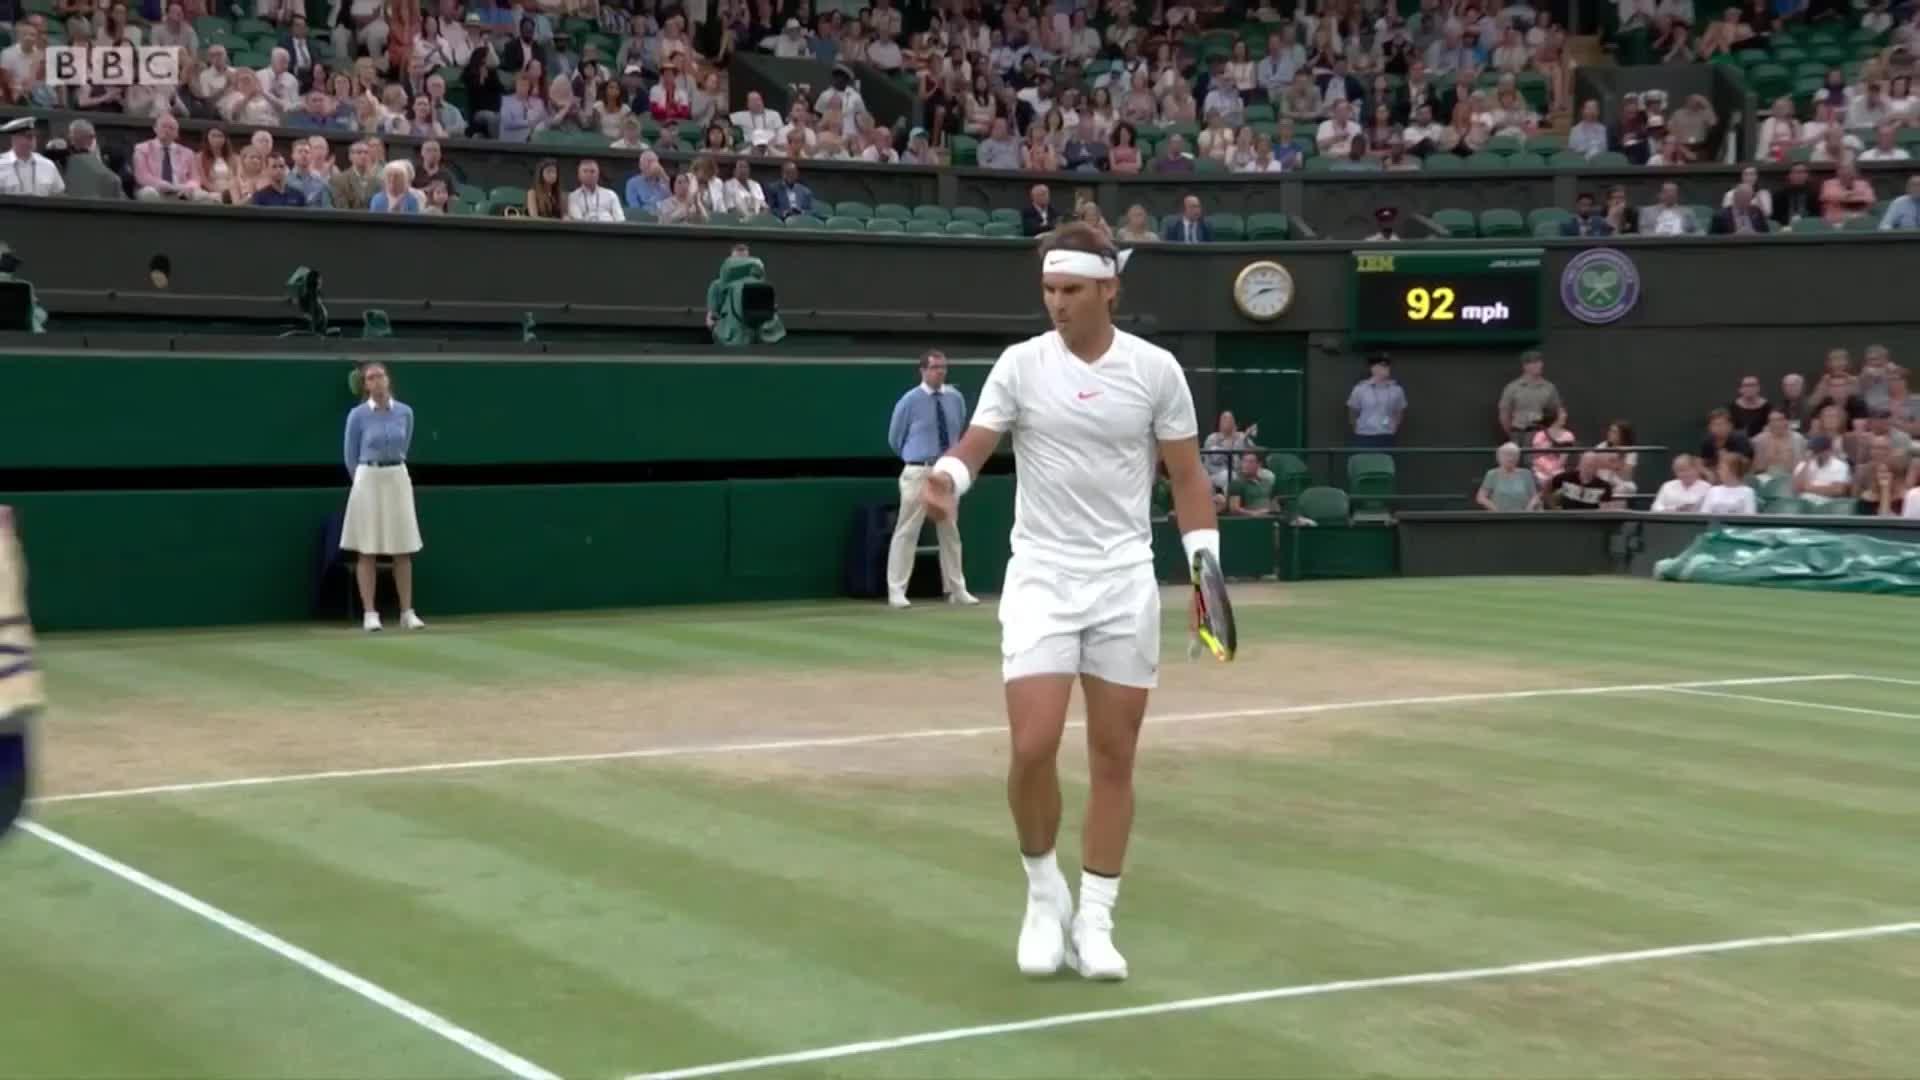 Nadal12 GIFs